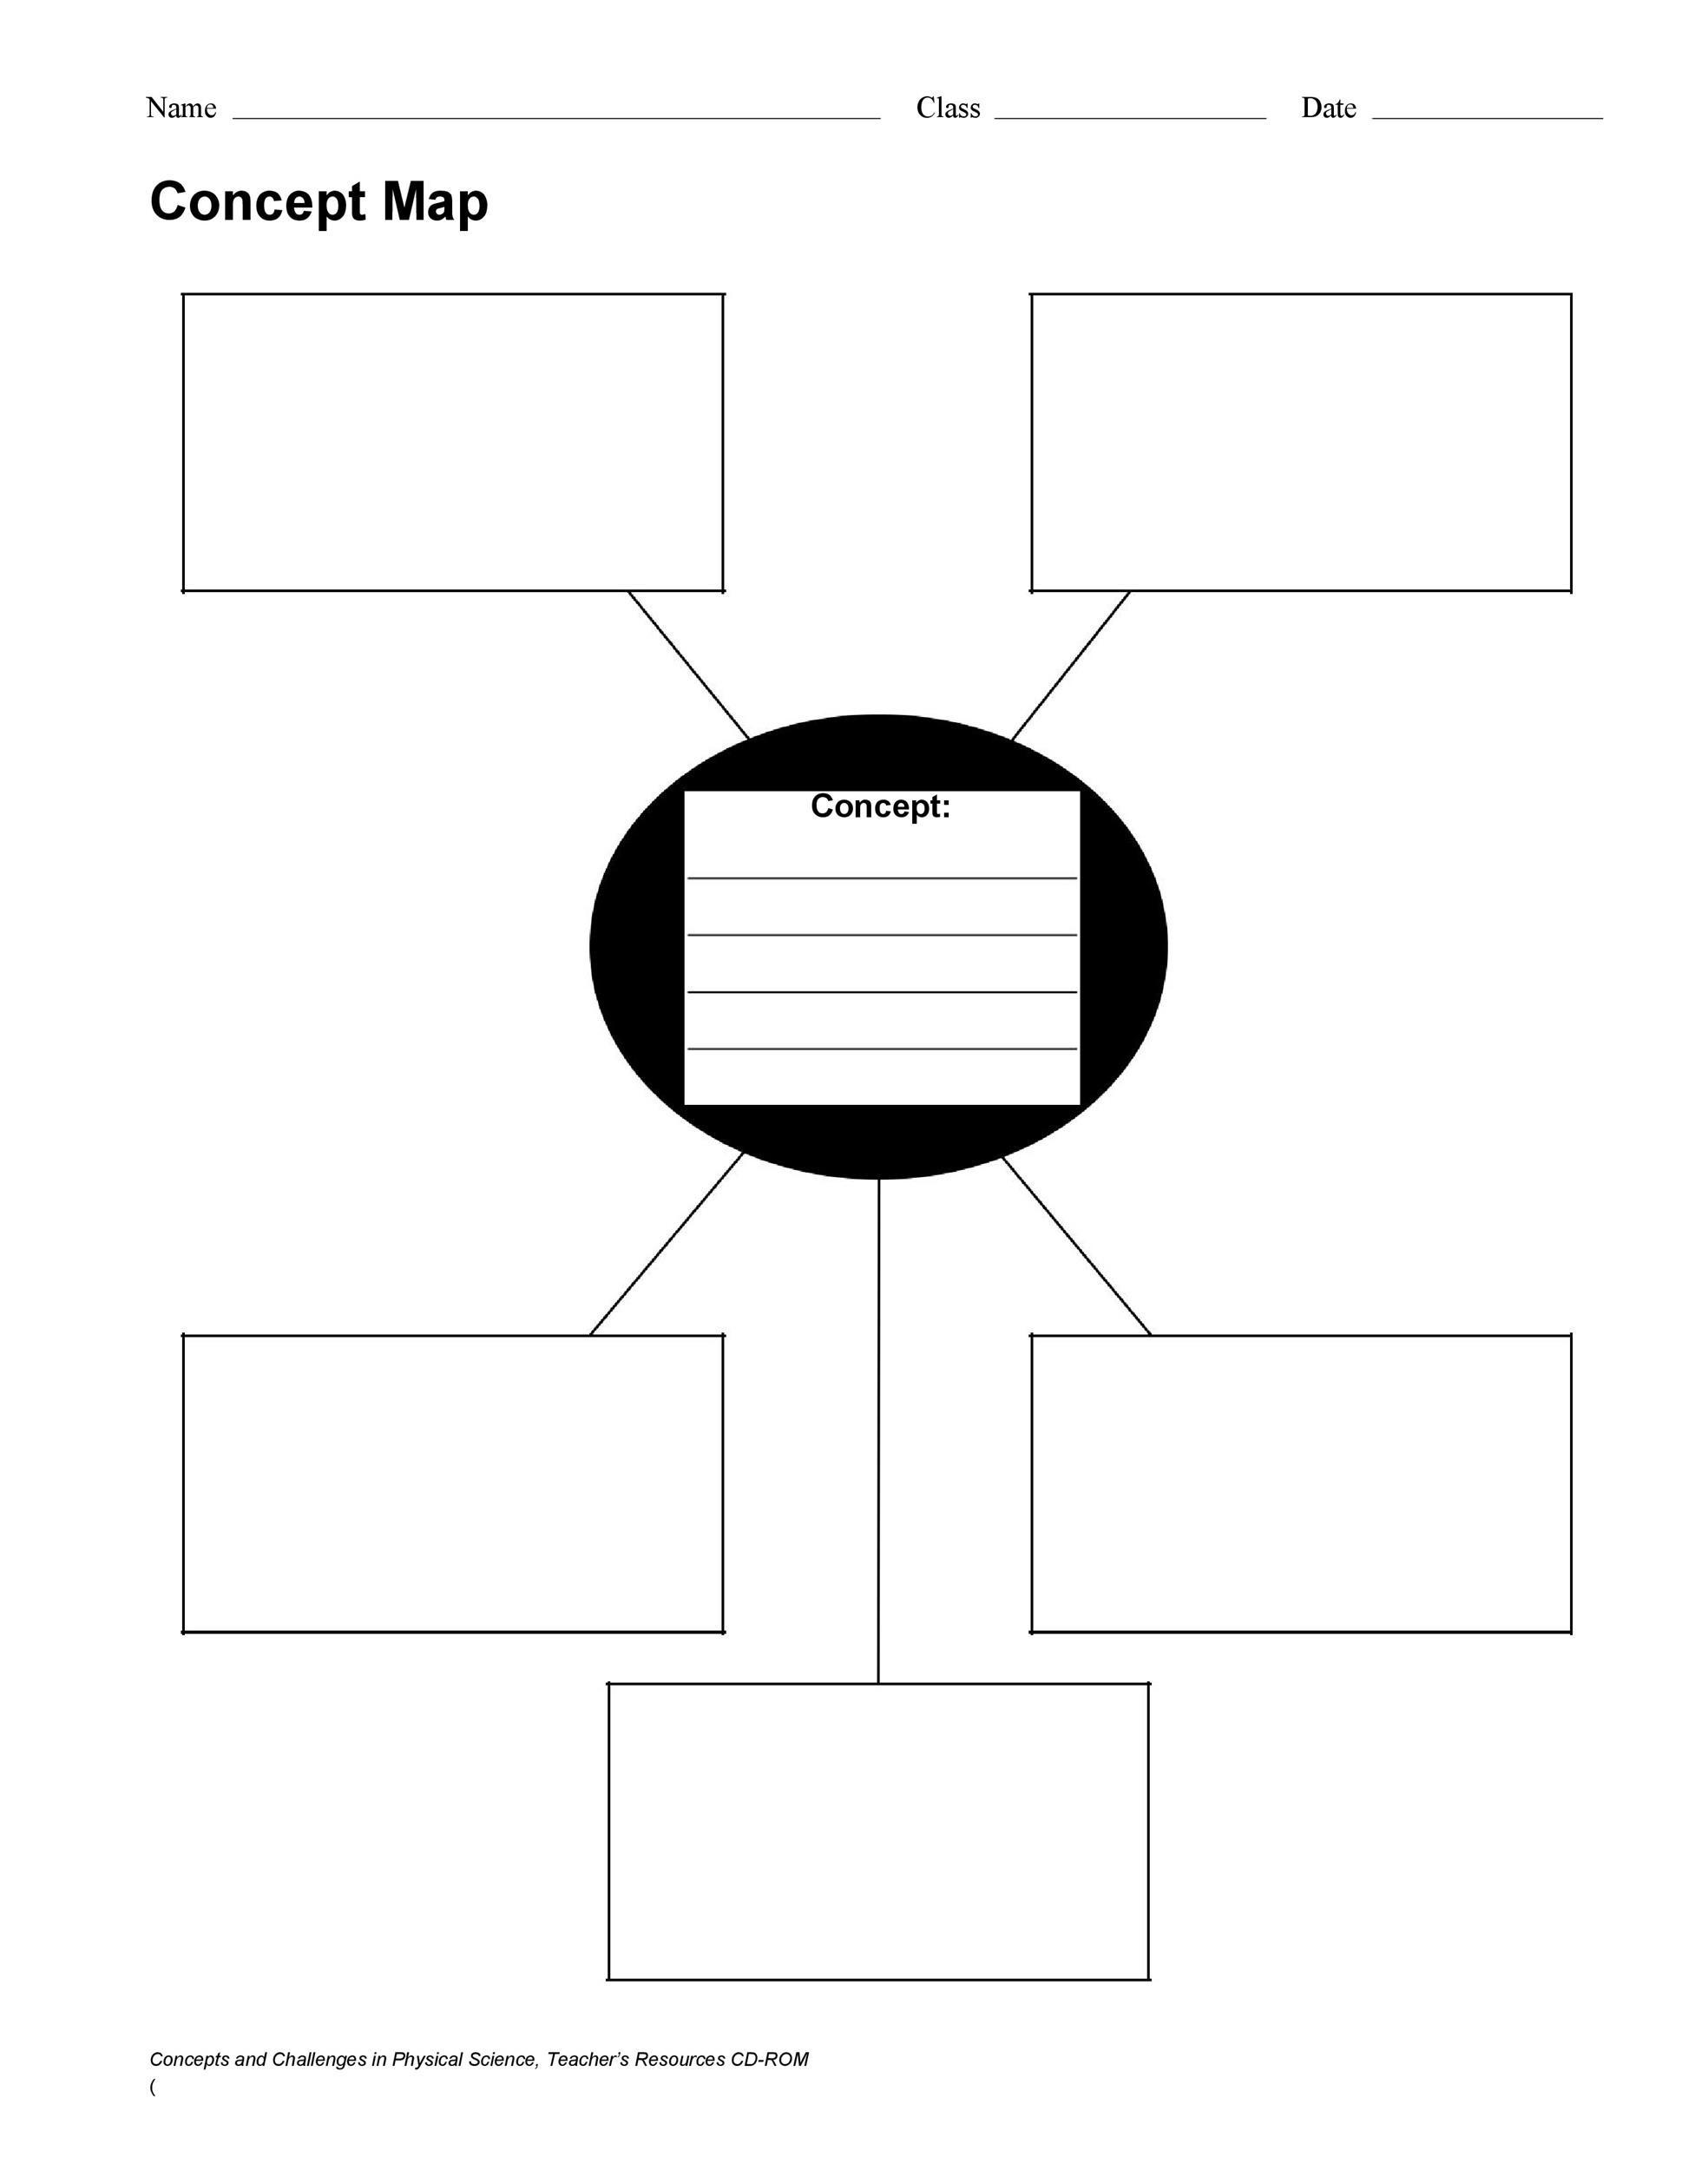 40+ Concept Map Templates [Hierarchical, Spider, Flowchart]